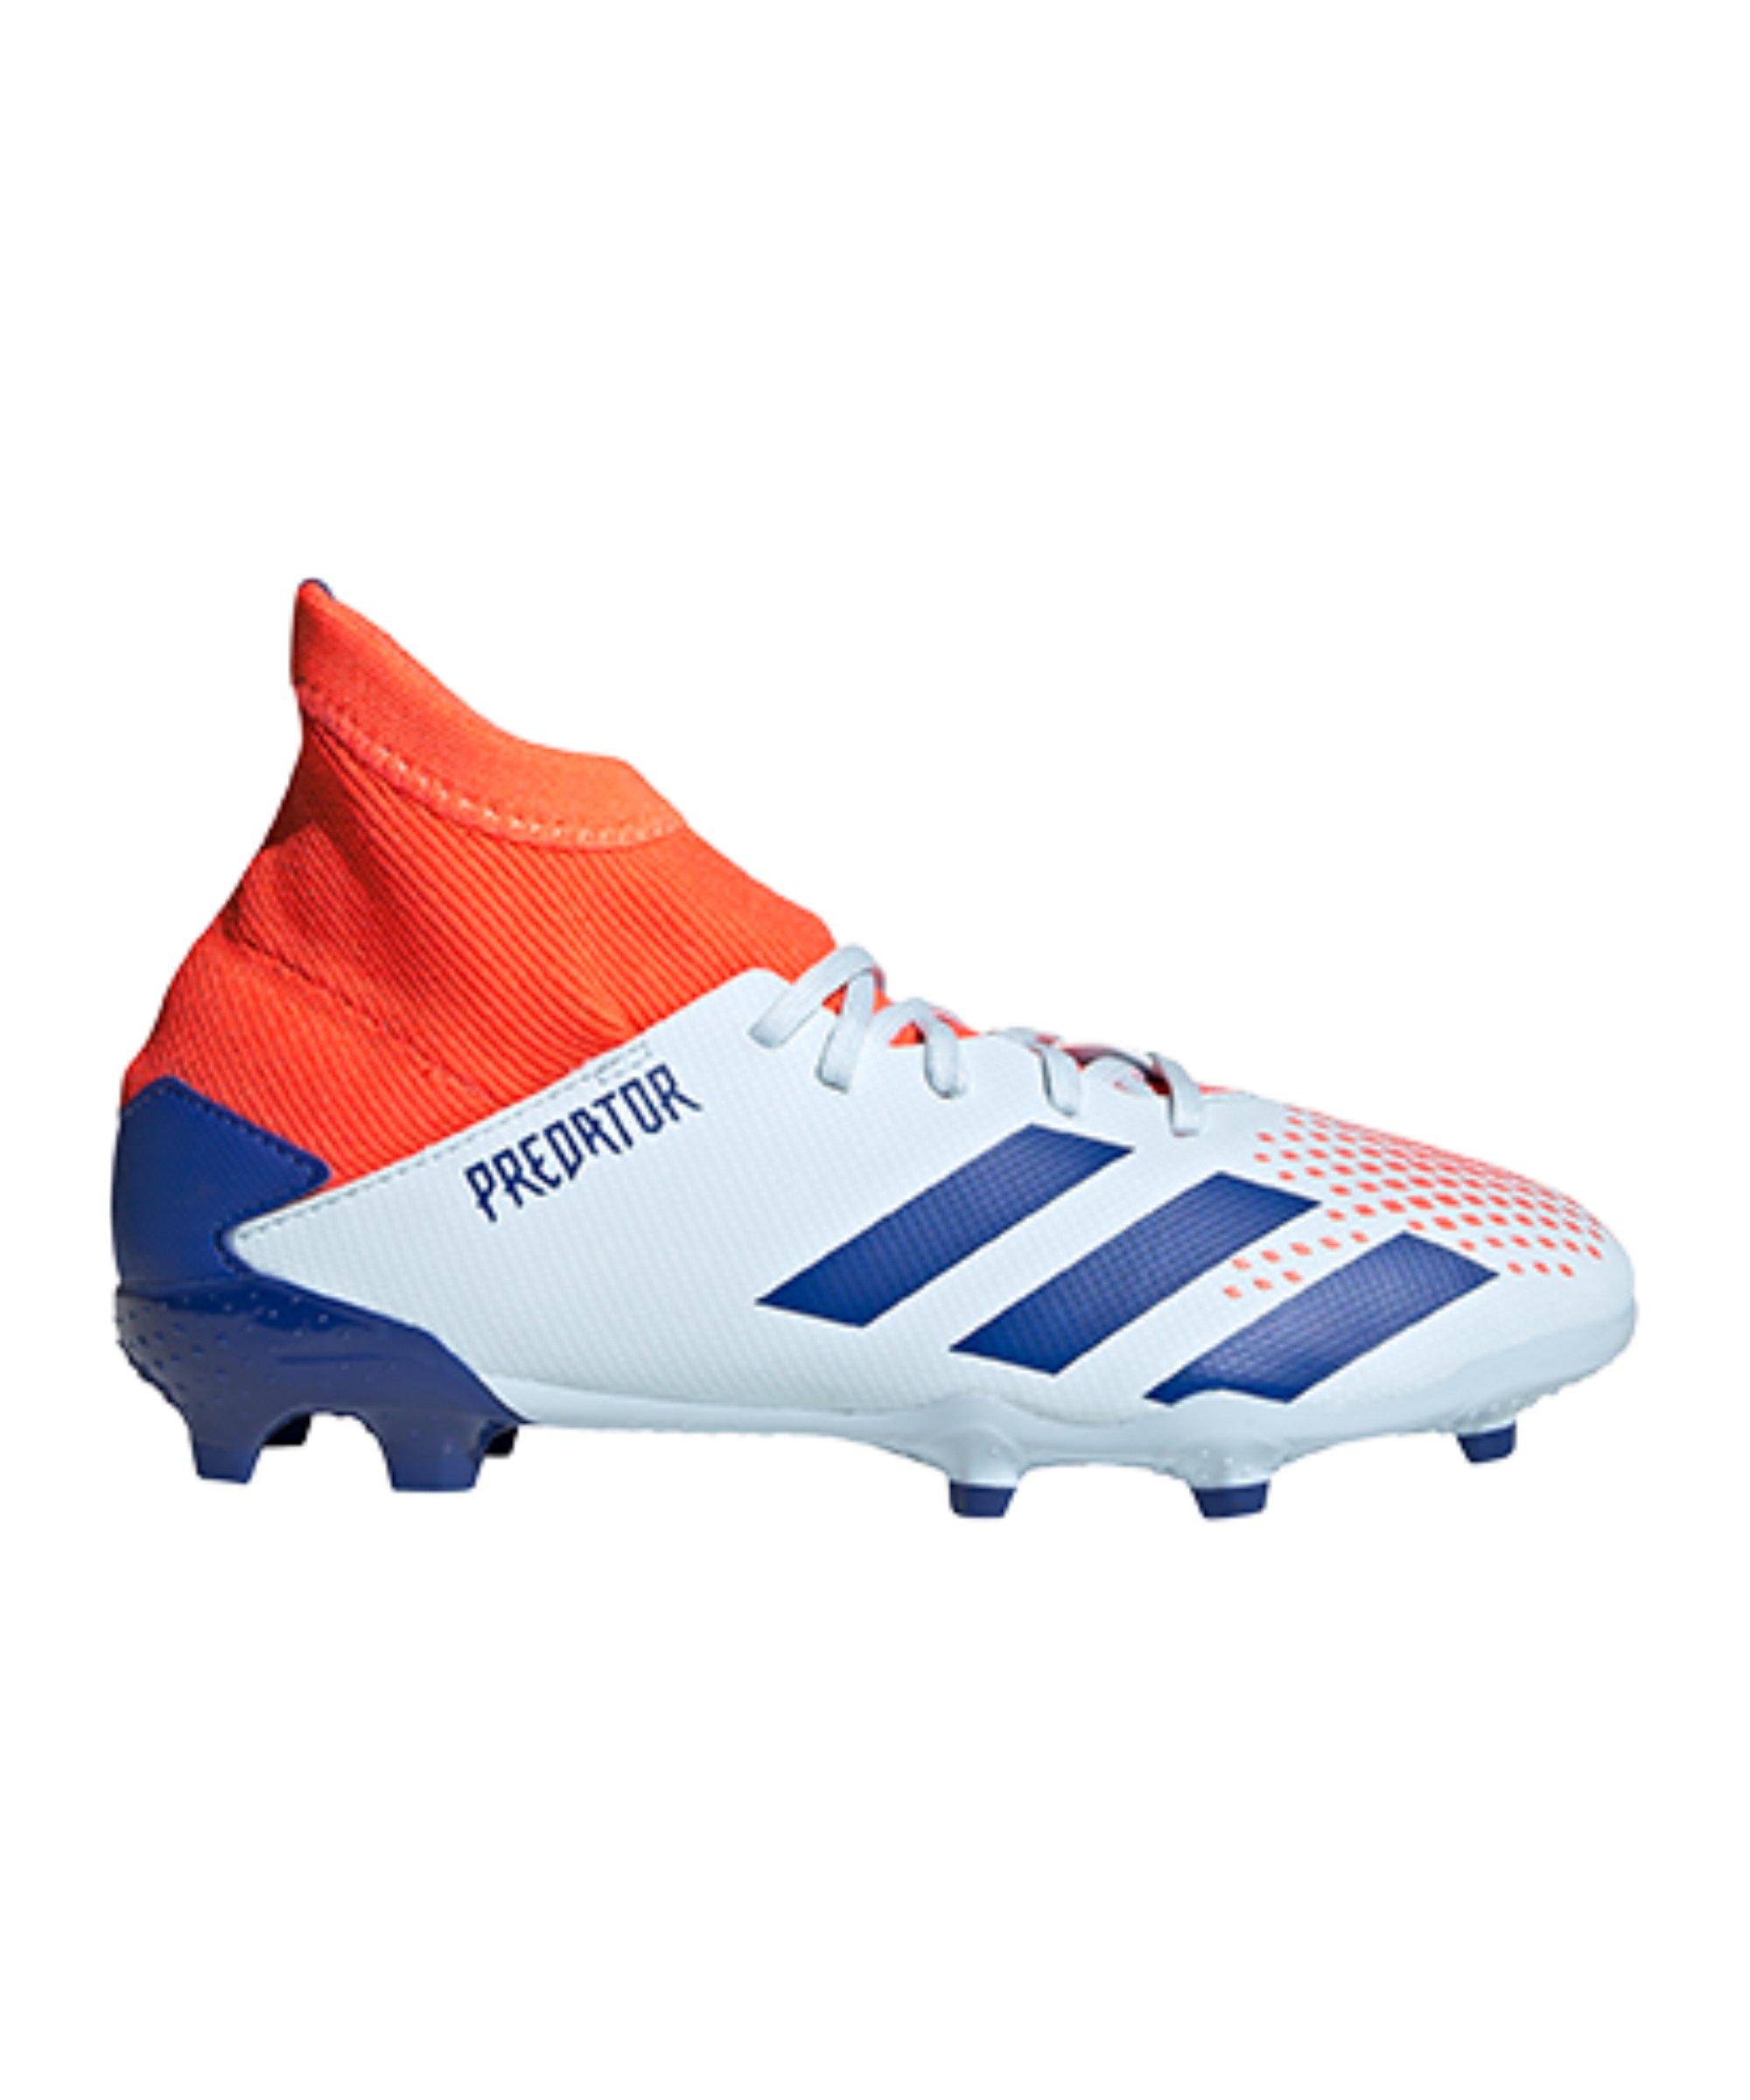 adidas Predator Glory Hunter 20.3 FG J Kids Blau Orange - blau